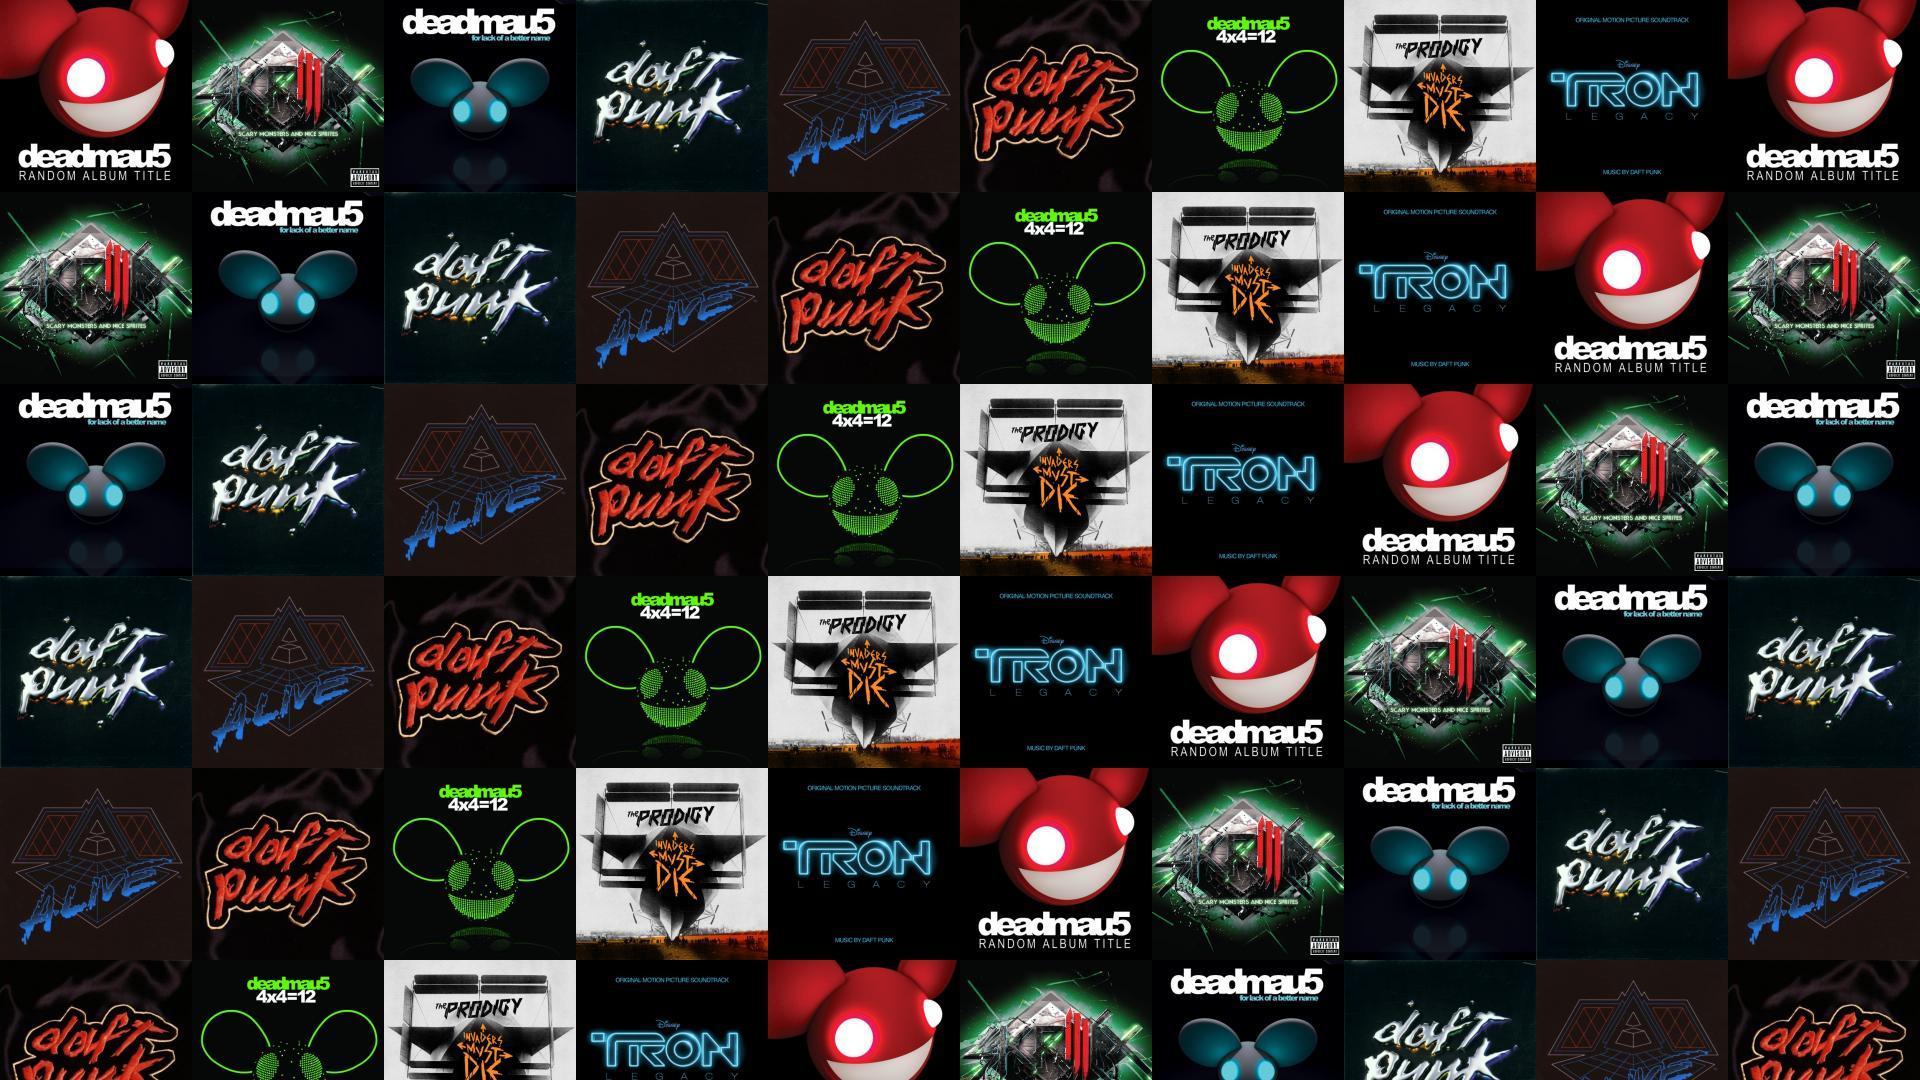 Deadmau5 Random Album Title Skrillex Scary Monsters Nice Wallpaper Tiled Desktop